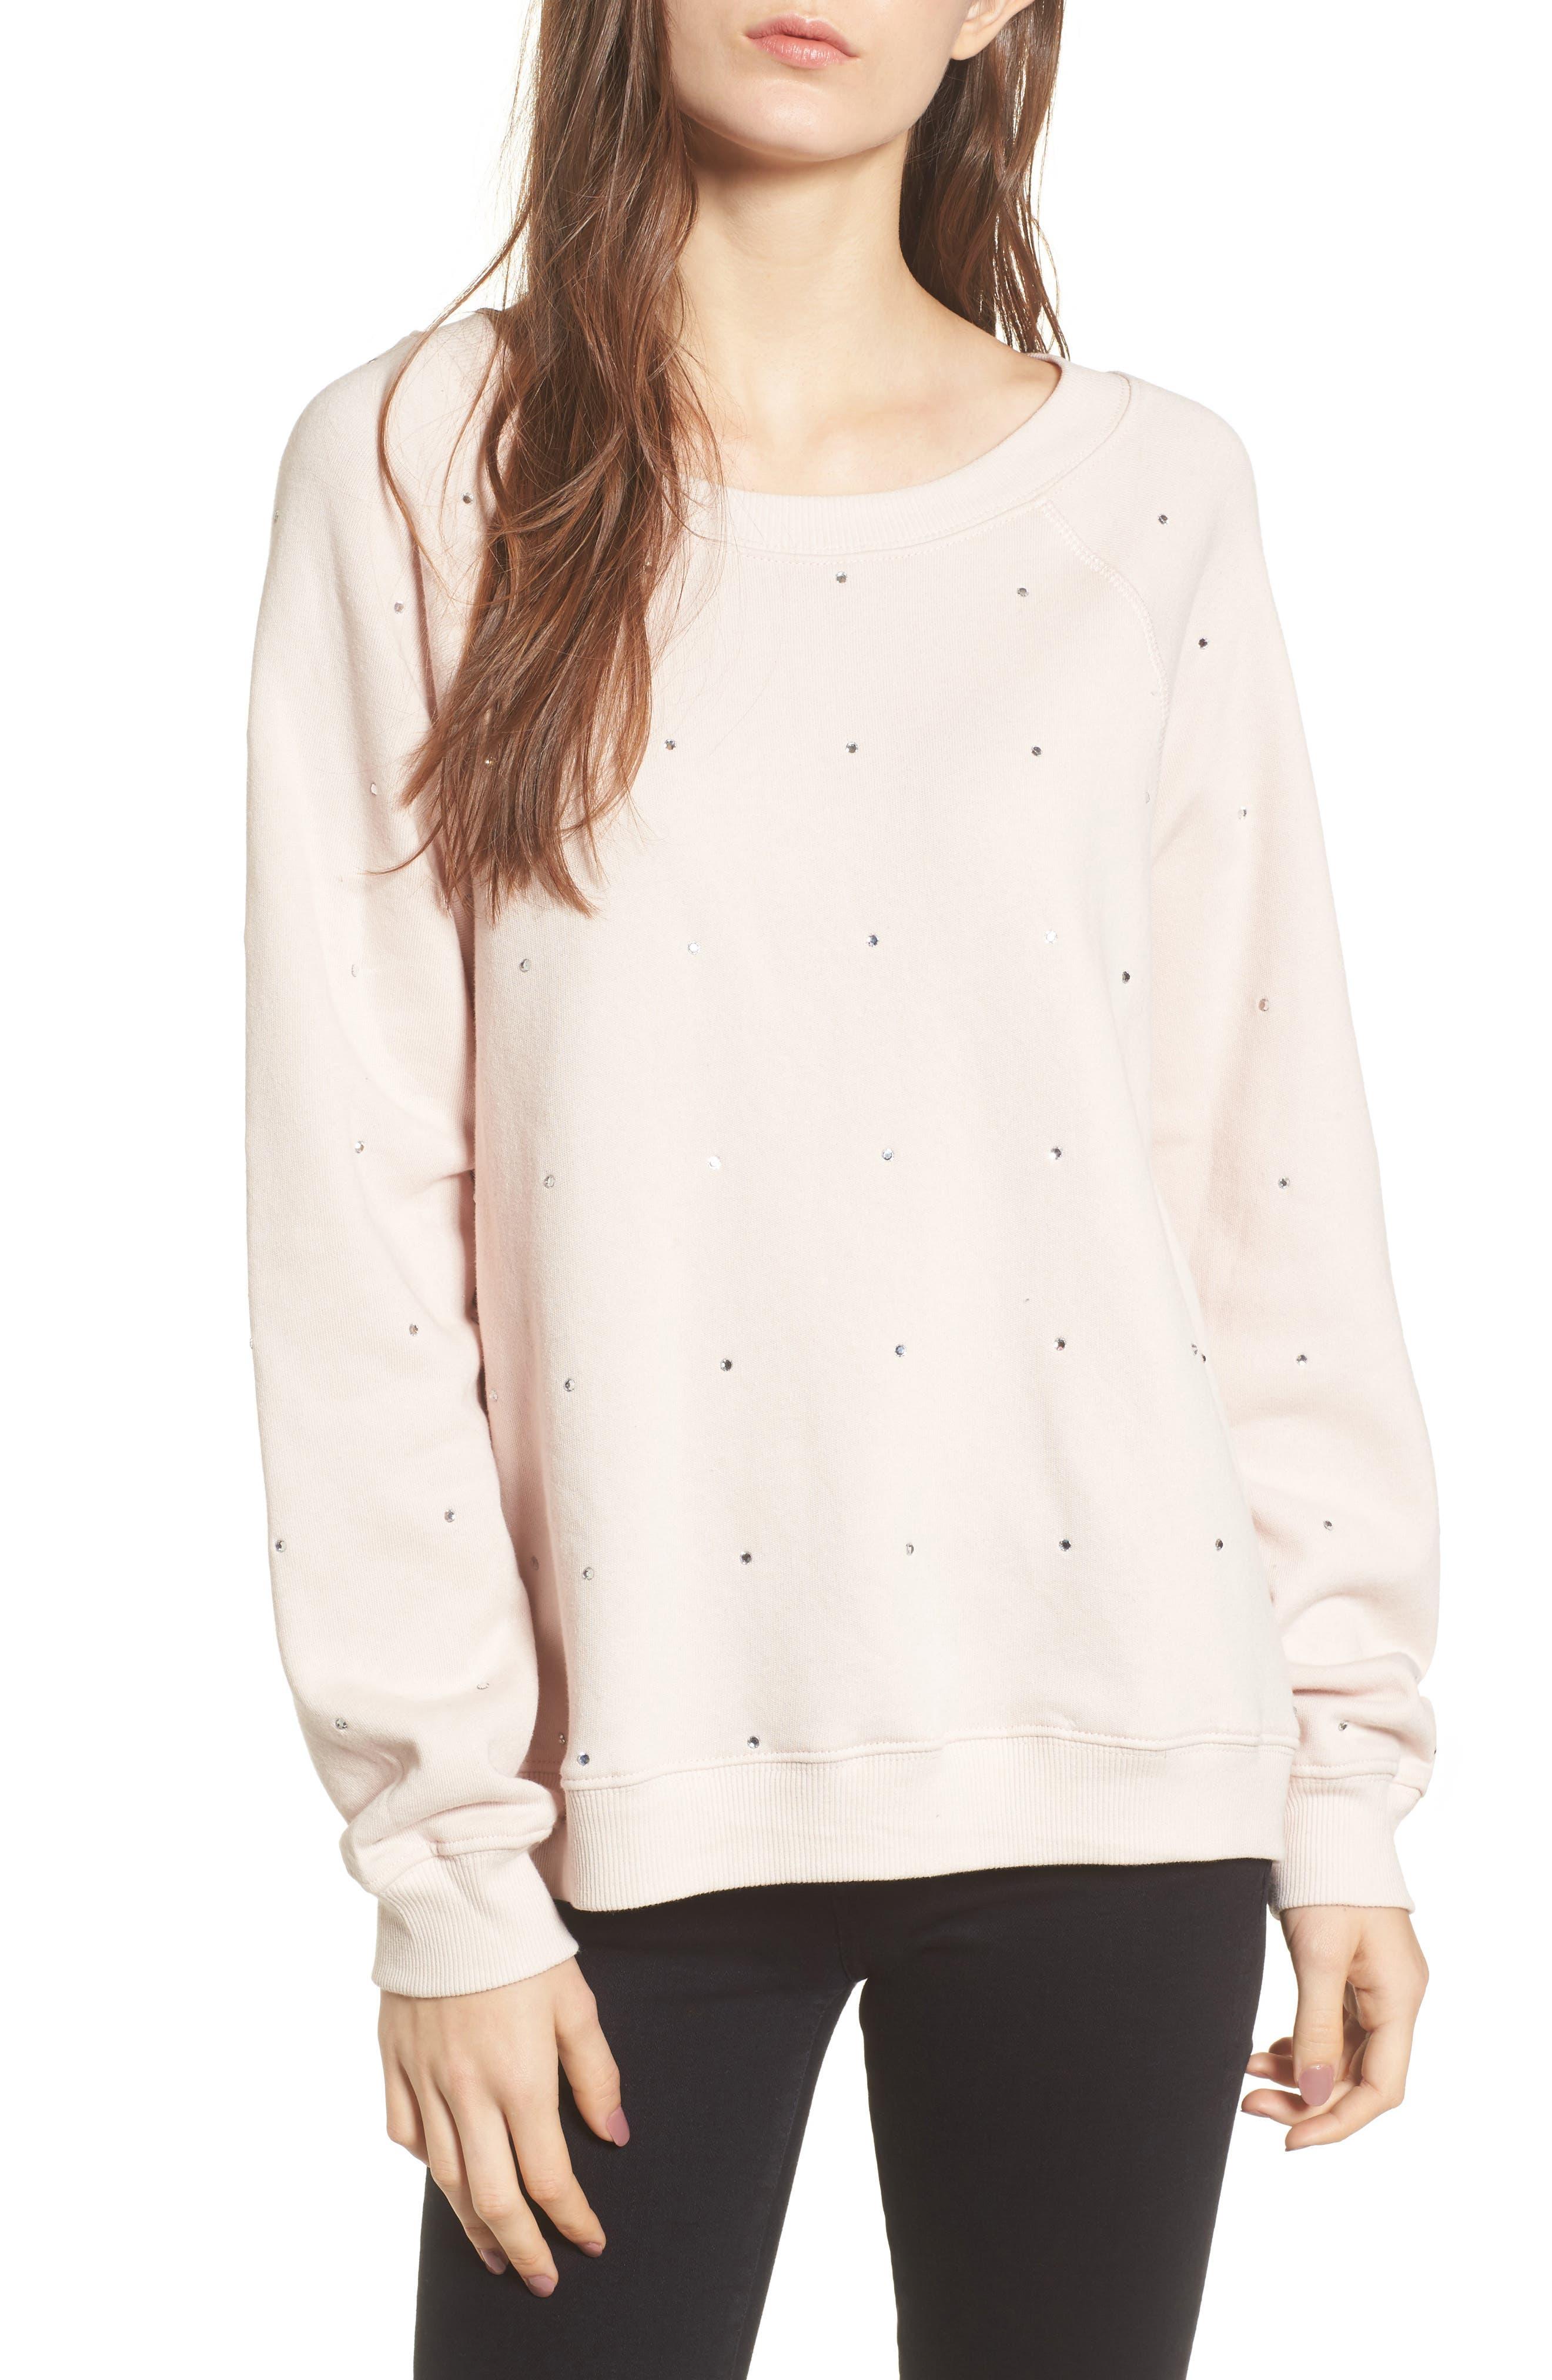 Glitz Sweatshirt,                             Main thumbnail 1, color,                             530